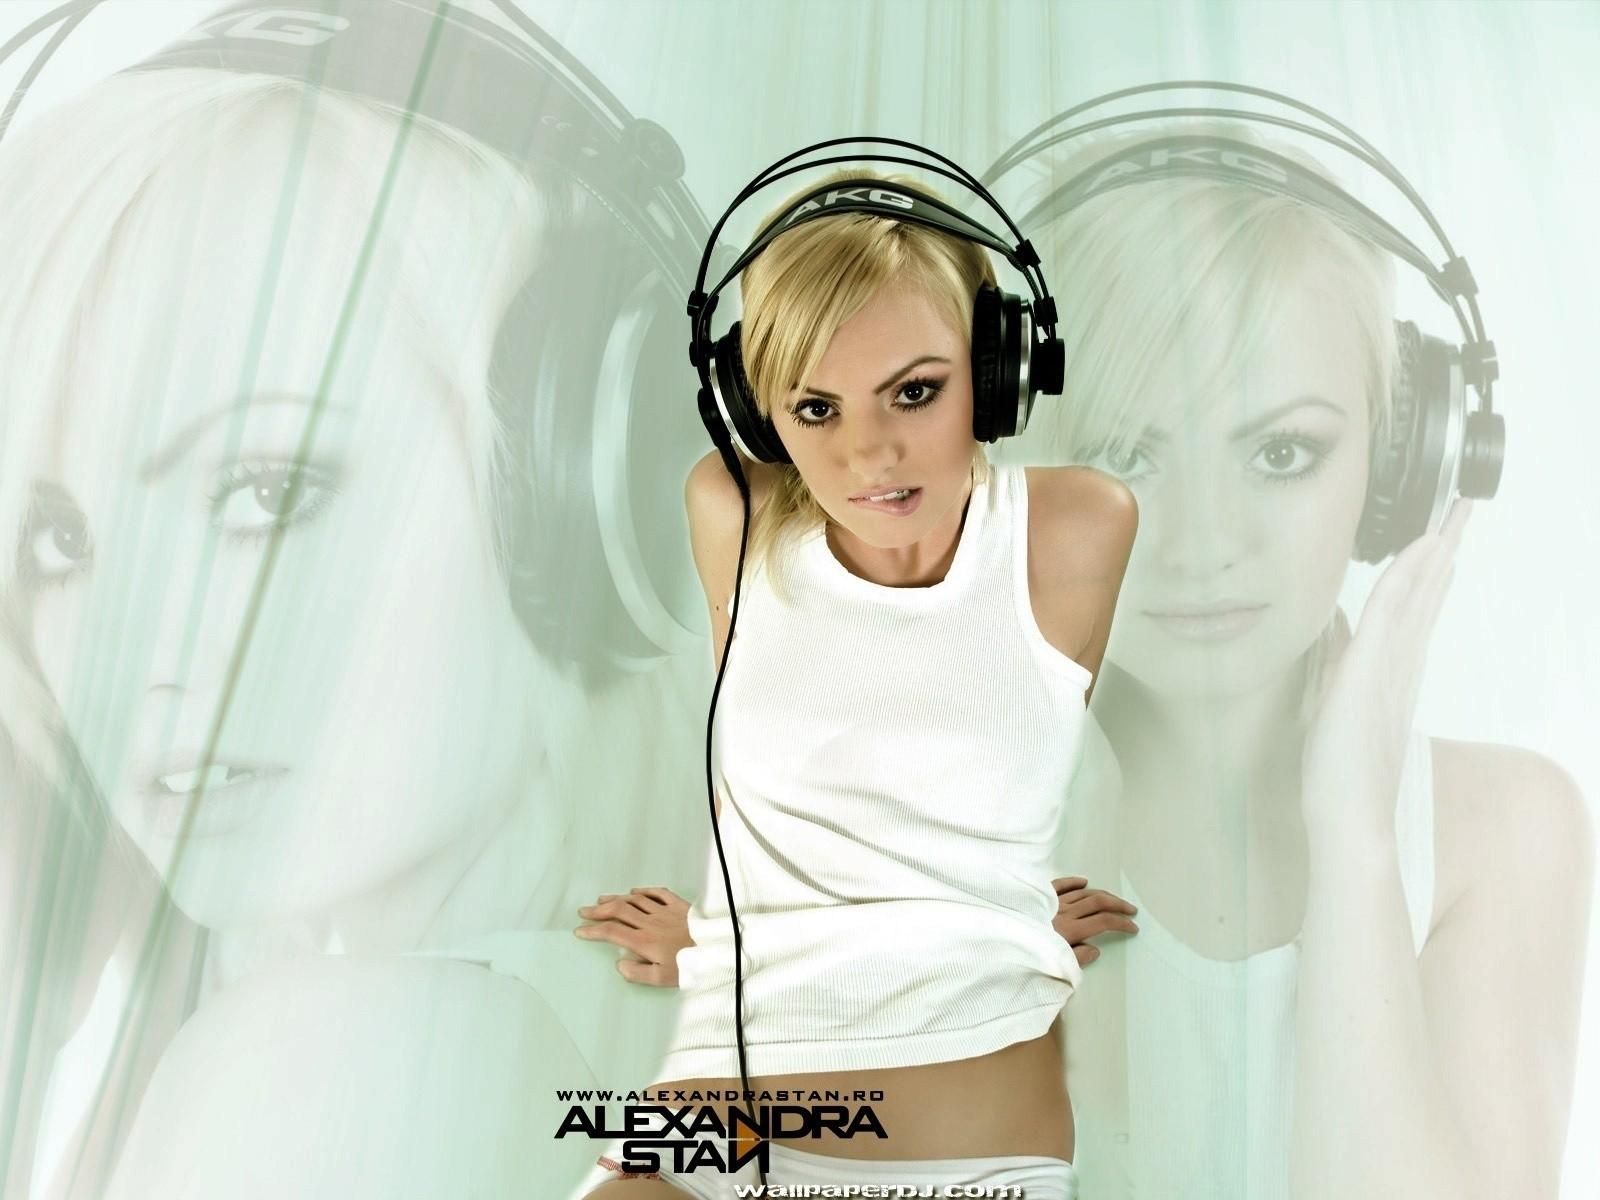 http://4.bp.blogspot.com/-wRH4rYbzJxU/T9ZebHuhjTI/AAAAAAAAEuk/9A2iv5VV_y0/s1600/alexandra-stan-headphones-women-wallpapers.jpg